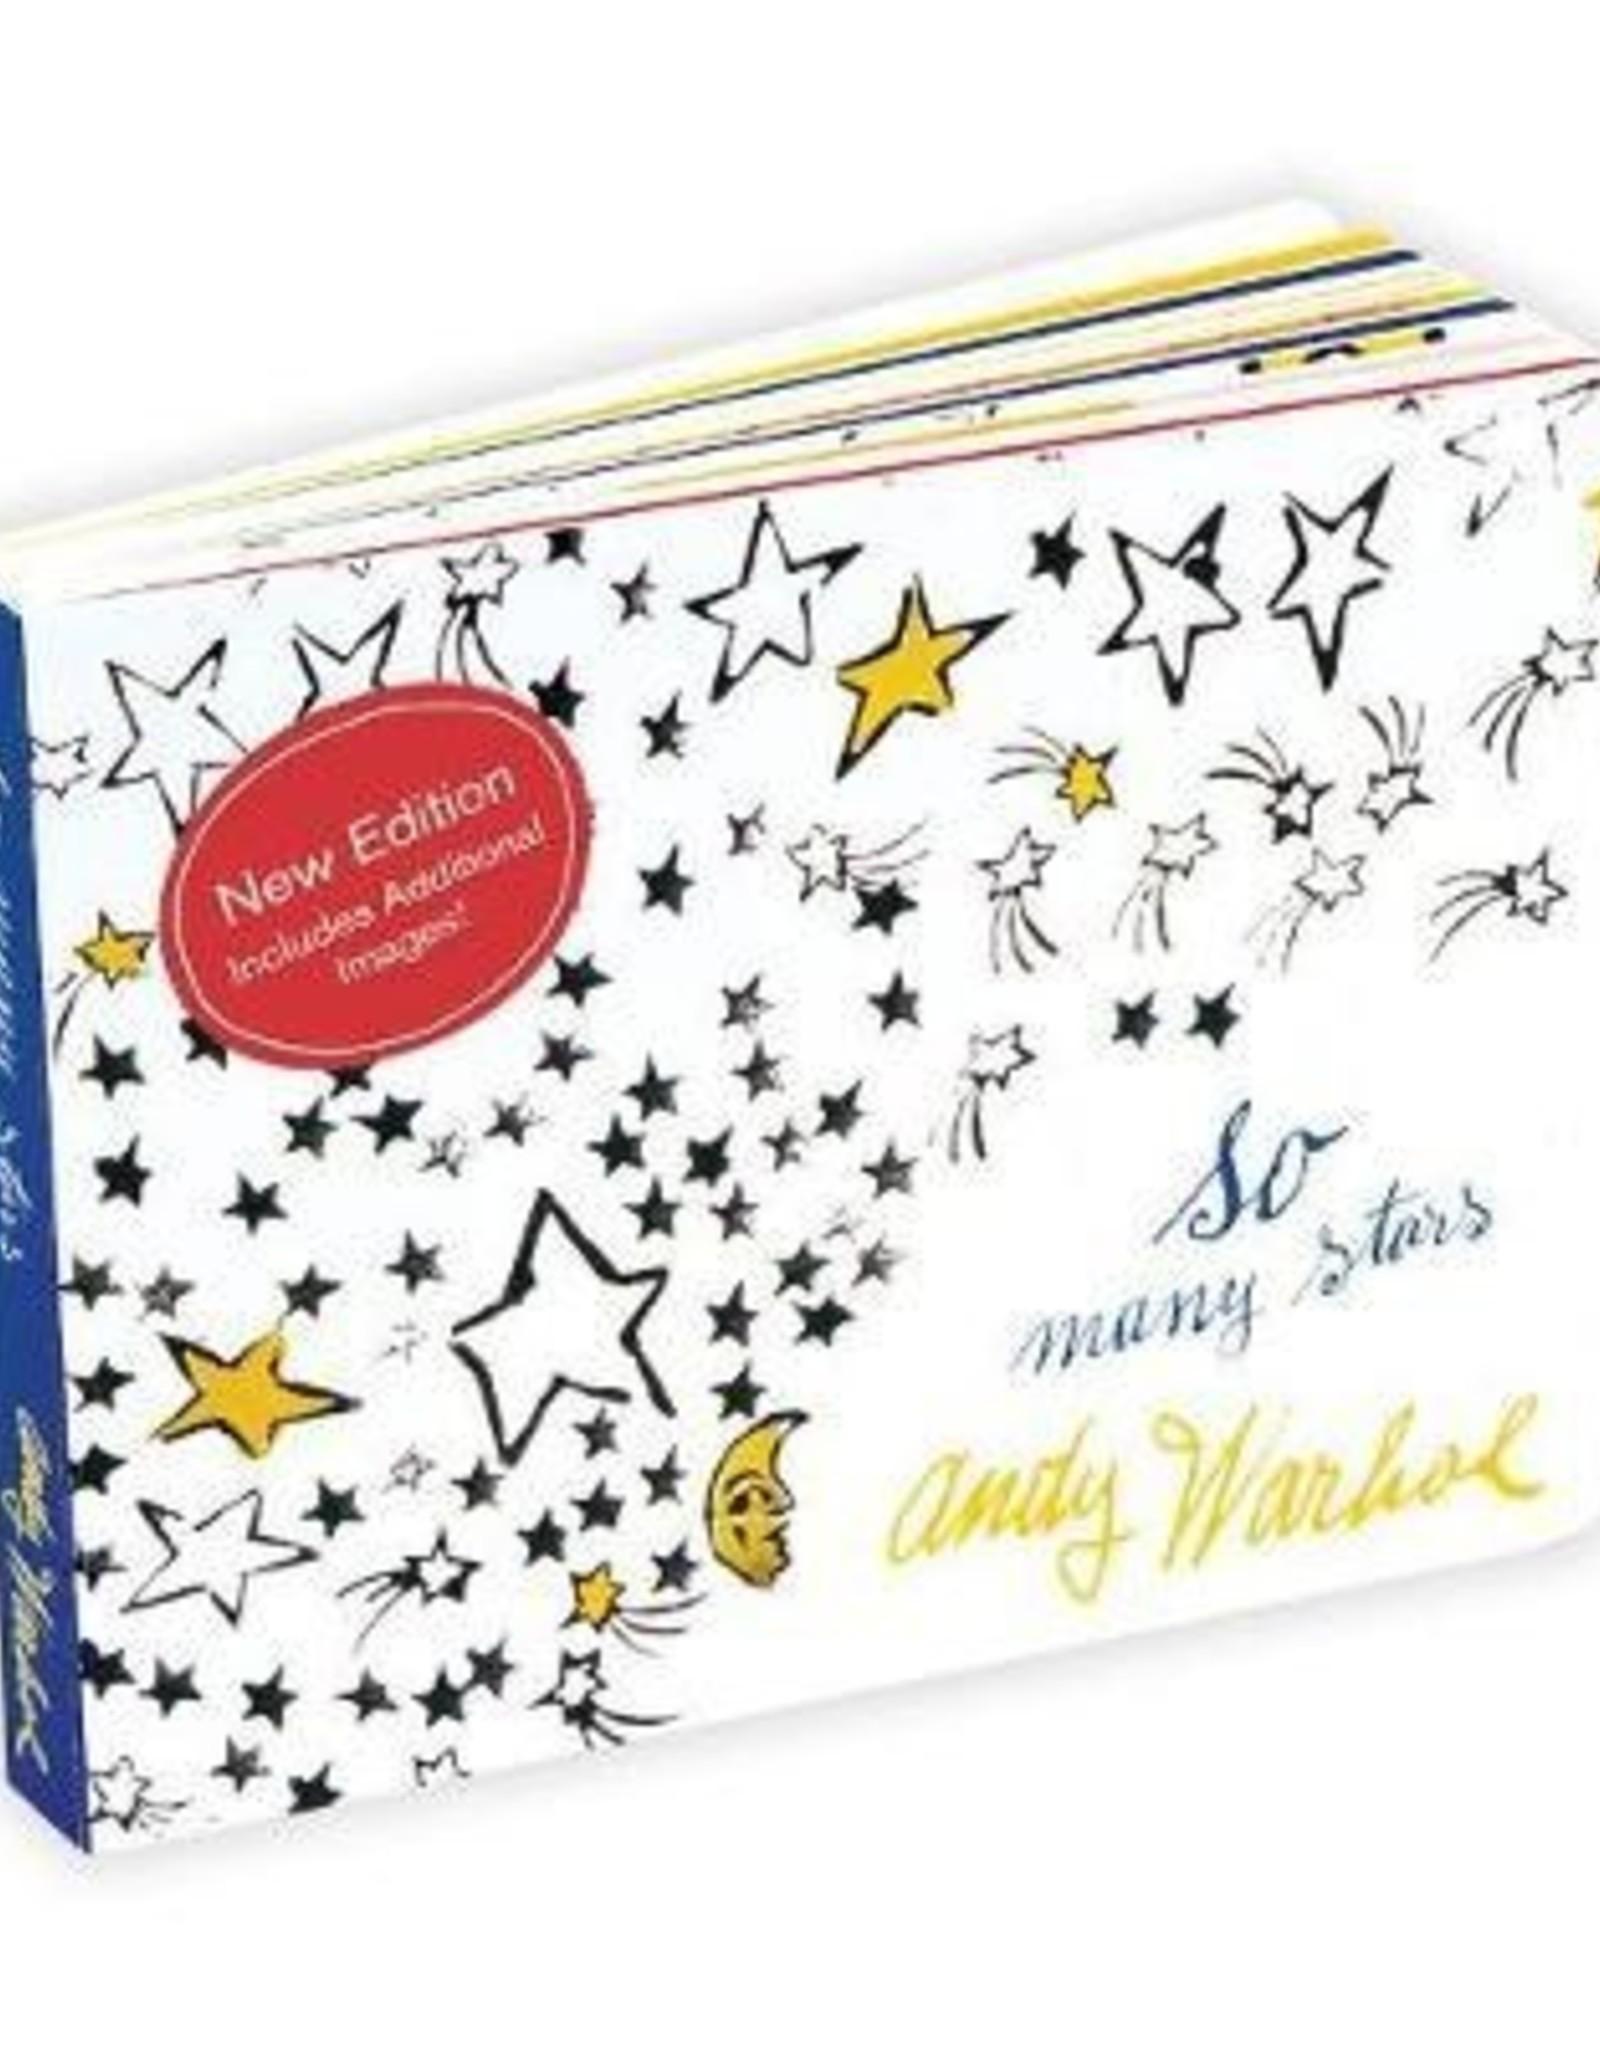 So Many Stars - Andy Warhol